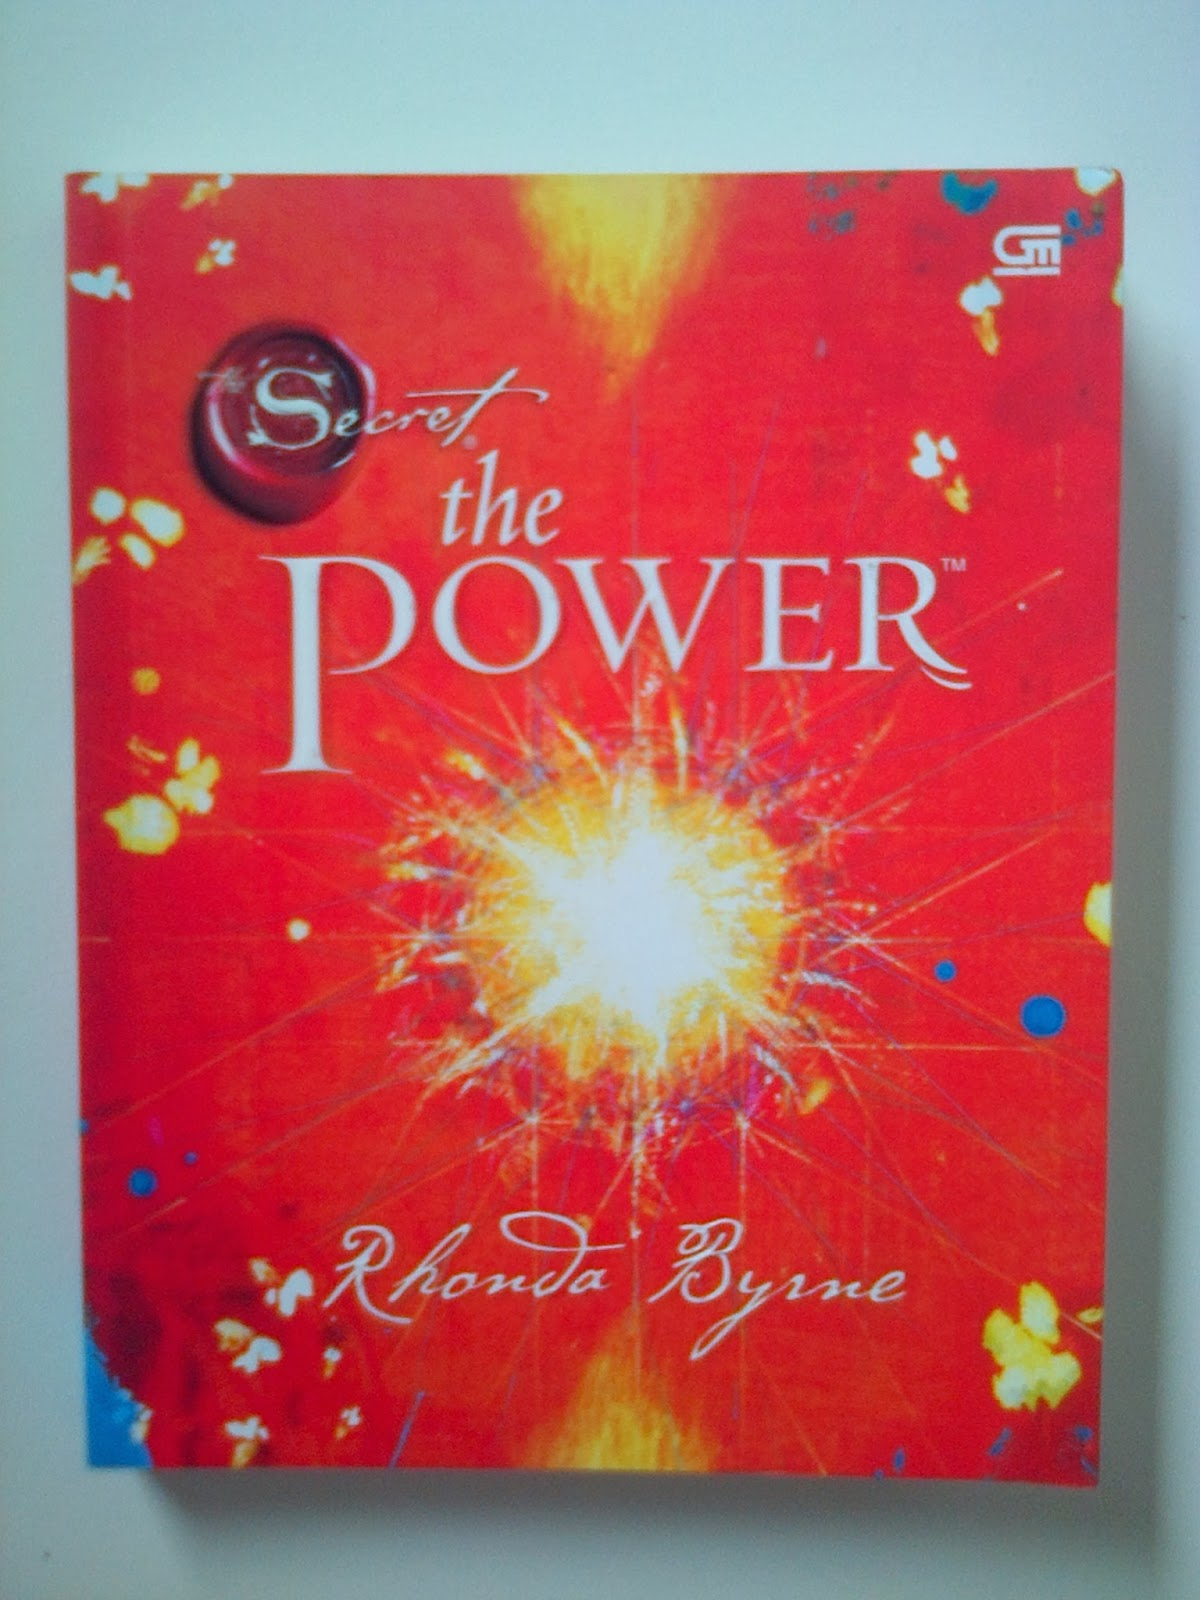 Jual Buku: Secret the Power (Rhonda Byrne)